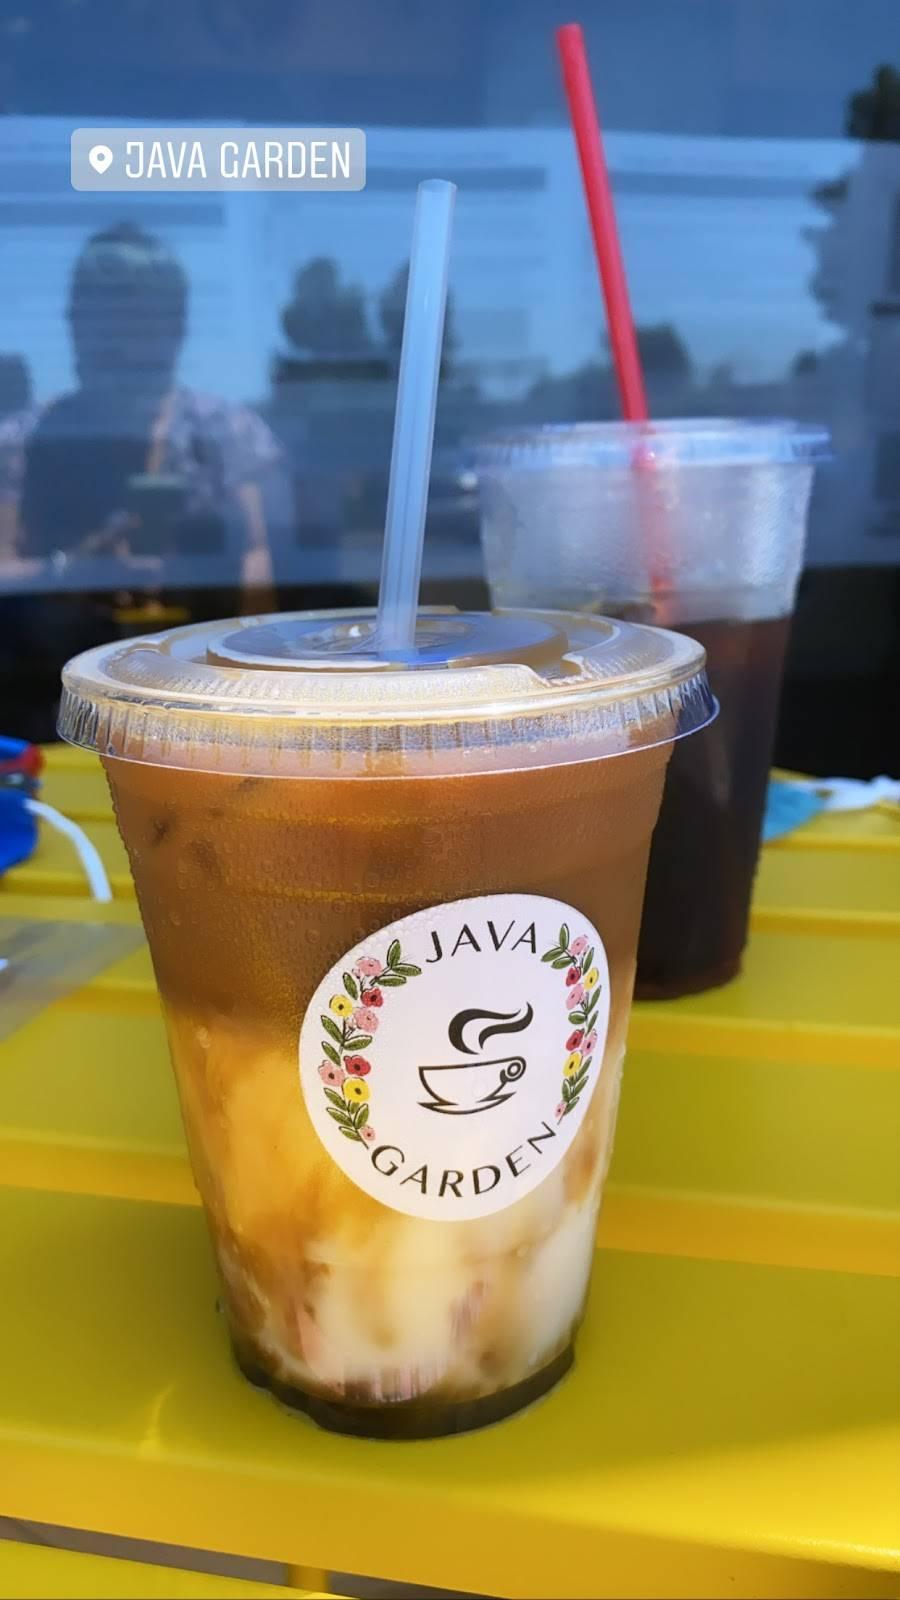 Java Garden - cafe    Photo 2 of 9   Address: 2699 Mission Village Dr, San Diego, CA 92123, USA   Phone: (858) 276-7045